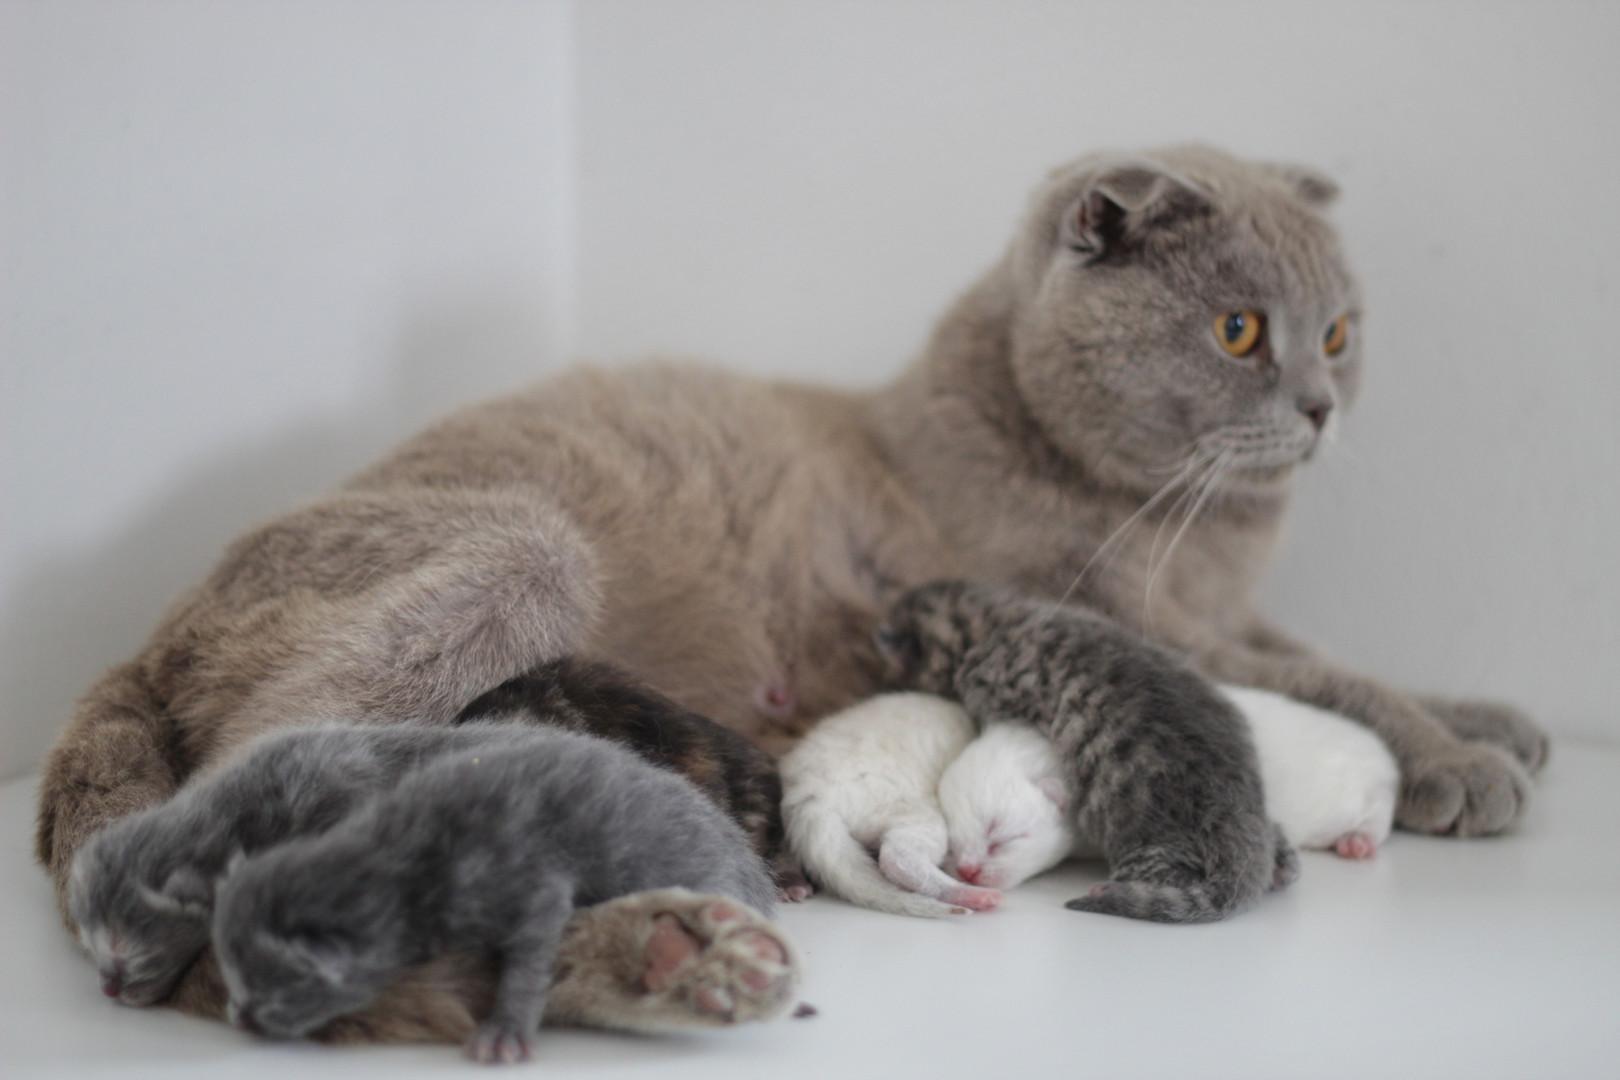 Lotus - Our Blue Scottish Fold & her Kittens